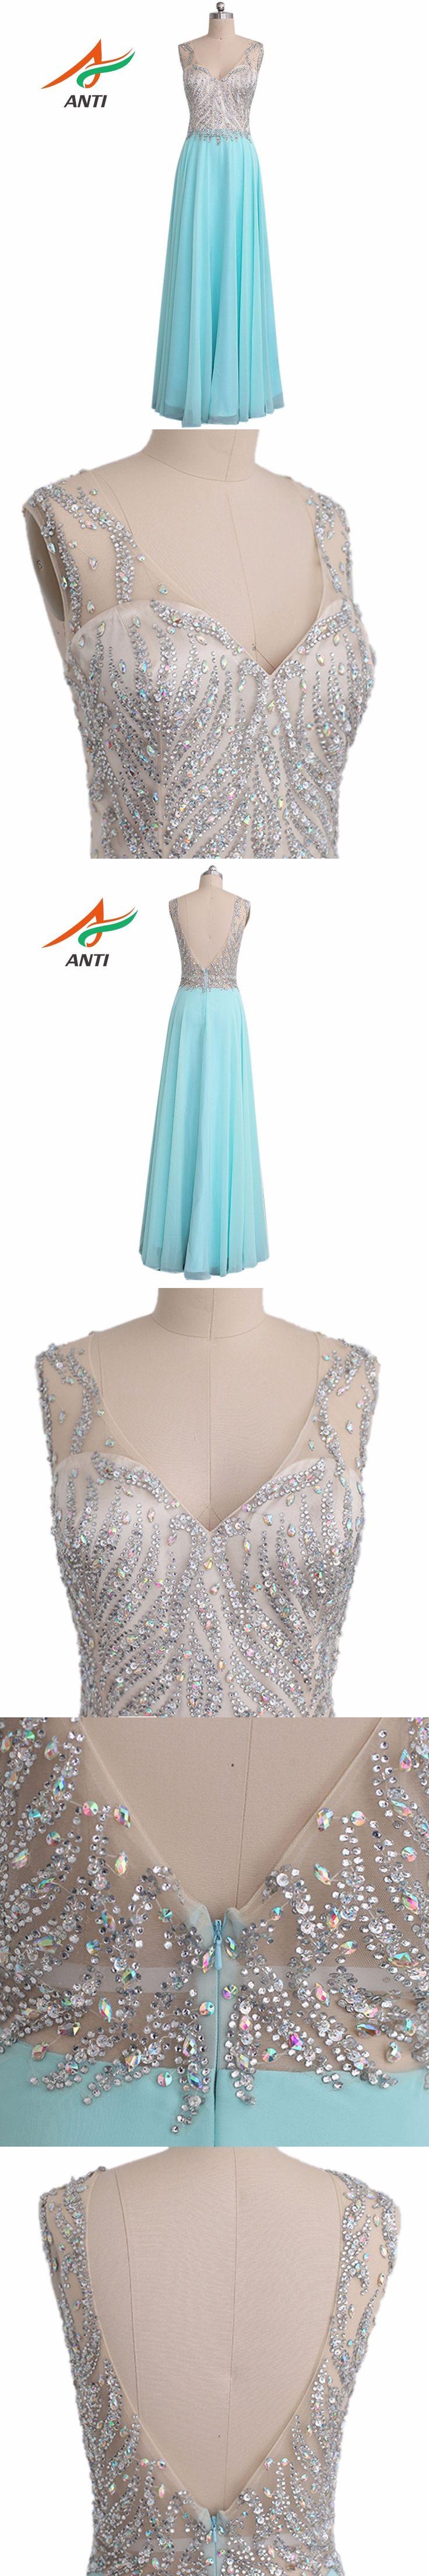 ANTI Elegant Mint Green Prom Dresses Long 2017 V-Neck Beaded Crystal Vestidos De Festa Formature A-Line Party Gala Dress HQY747